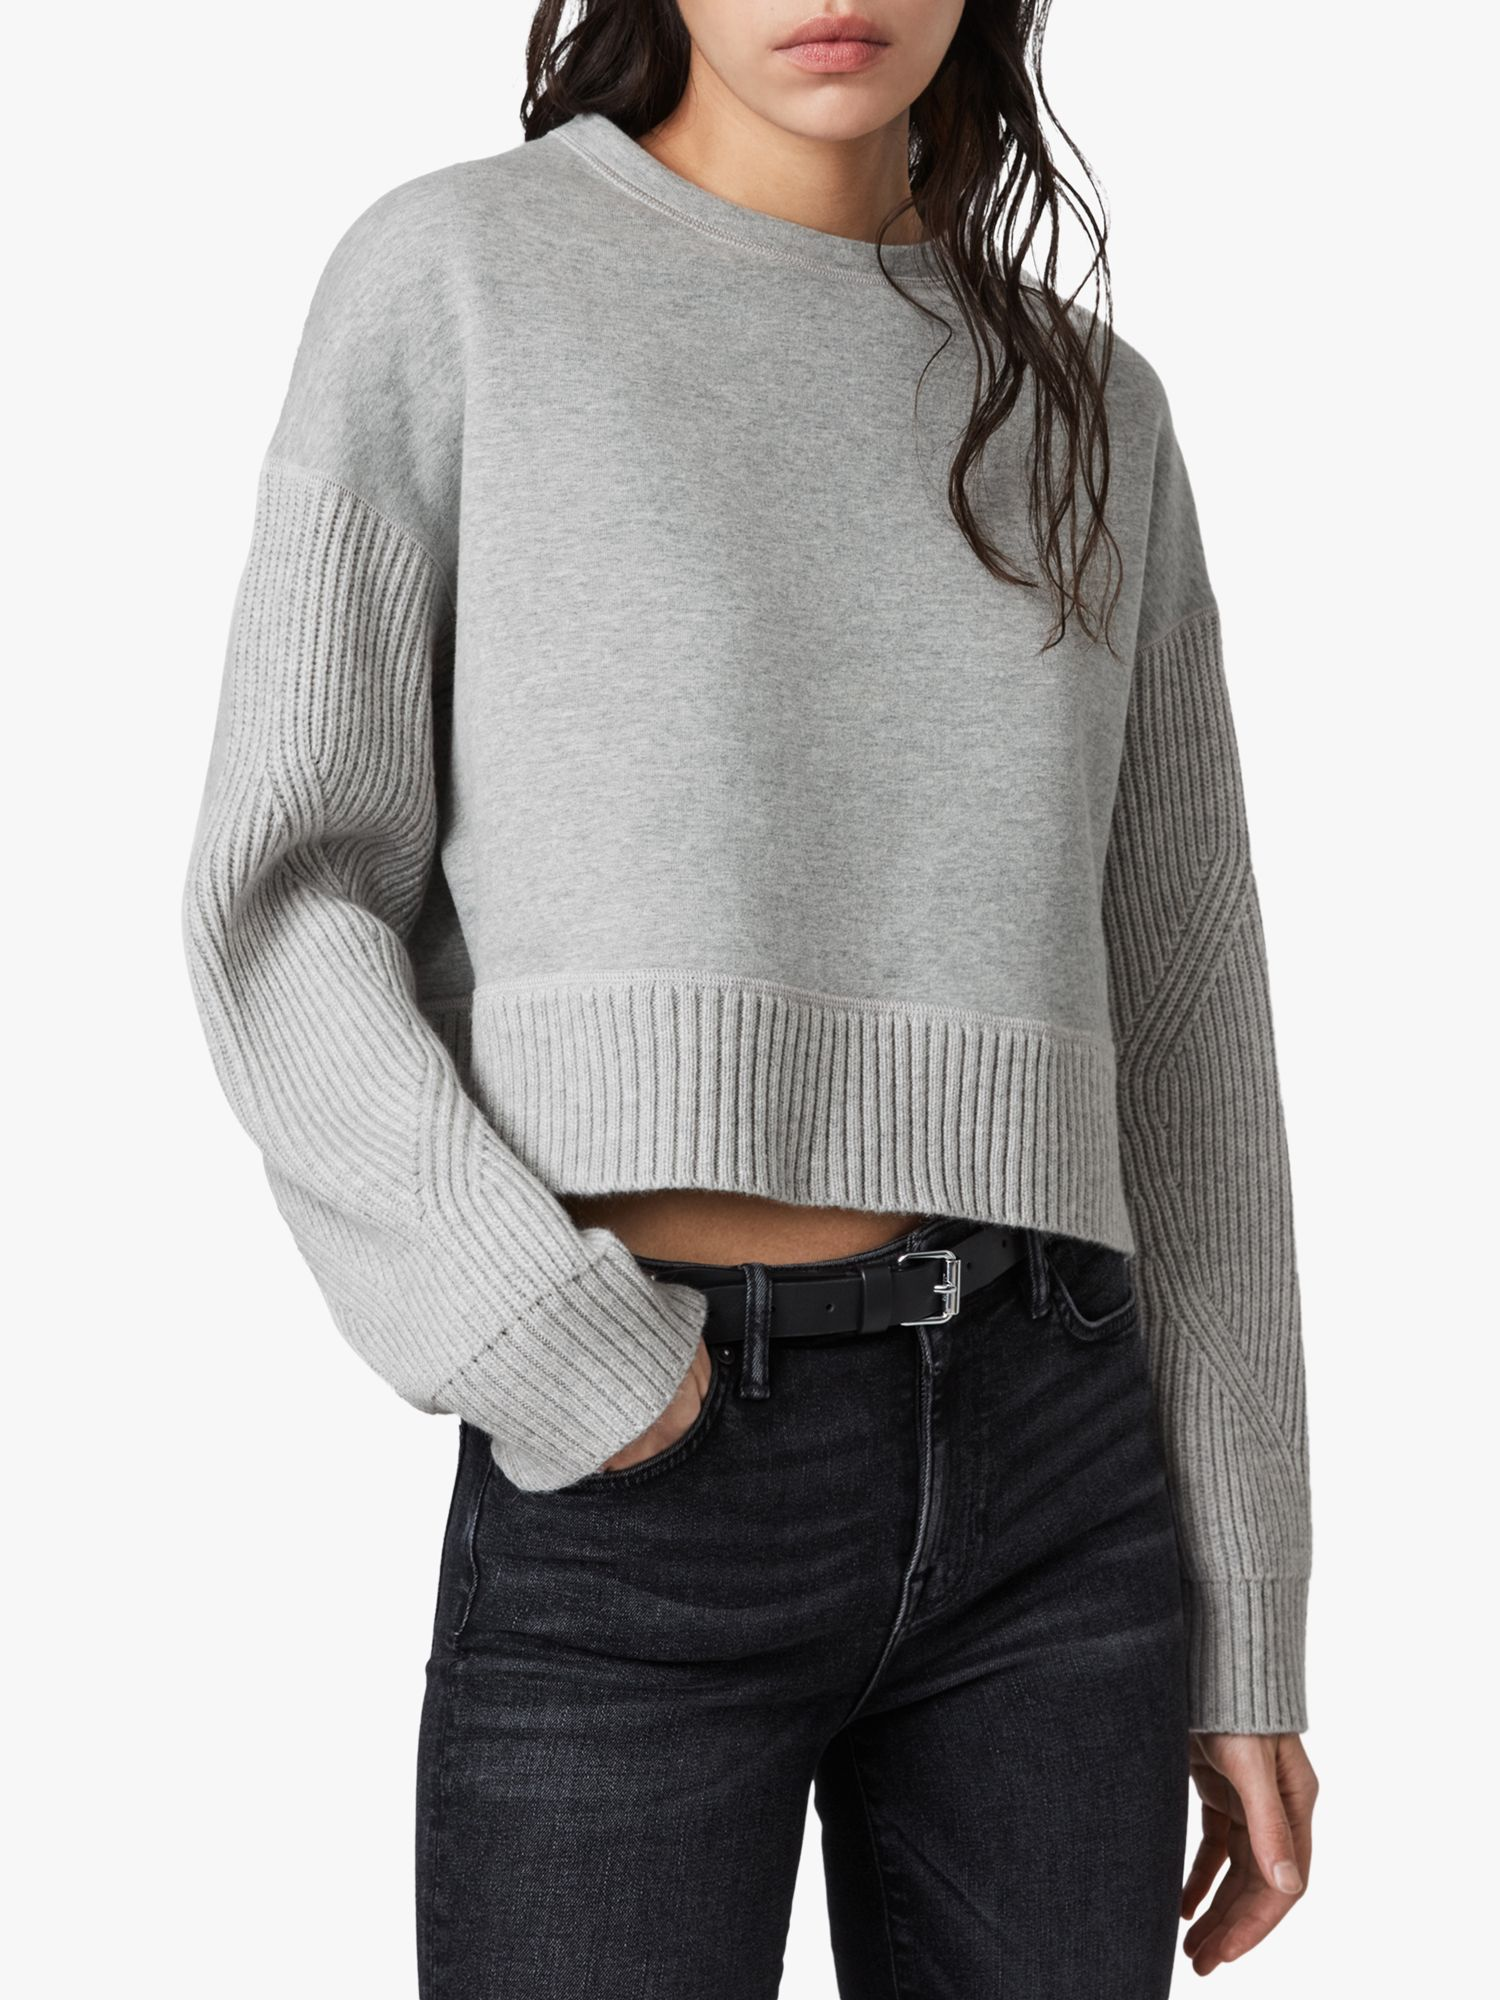 AllSaints AllSaints Perla Wool Blend Jumper, Grey